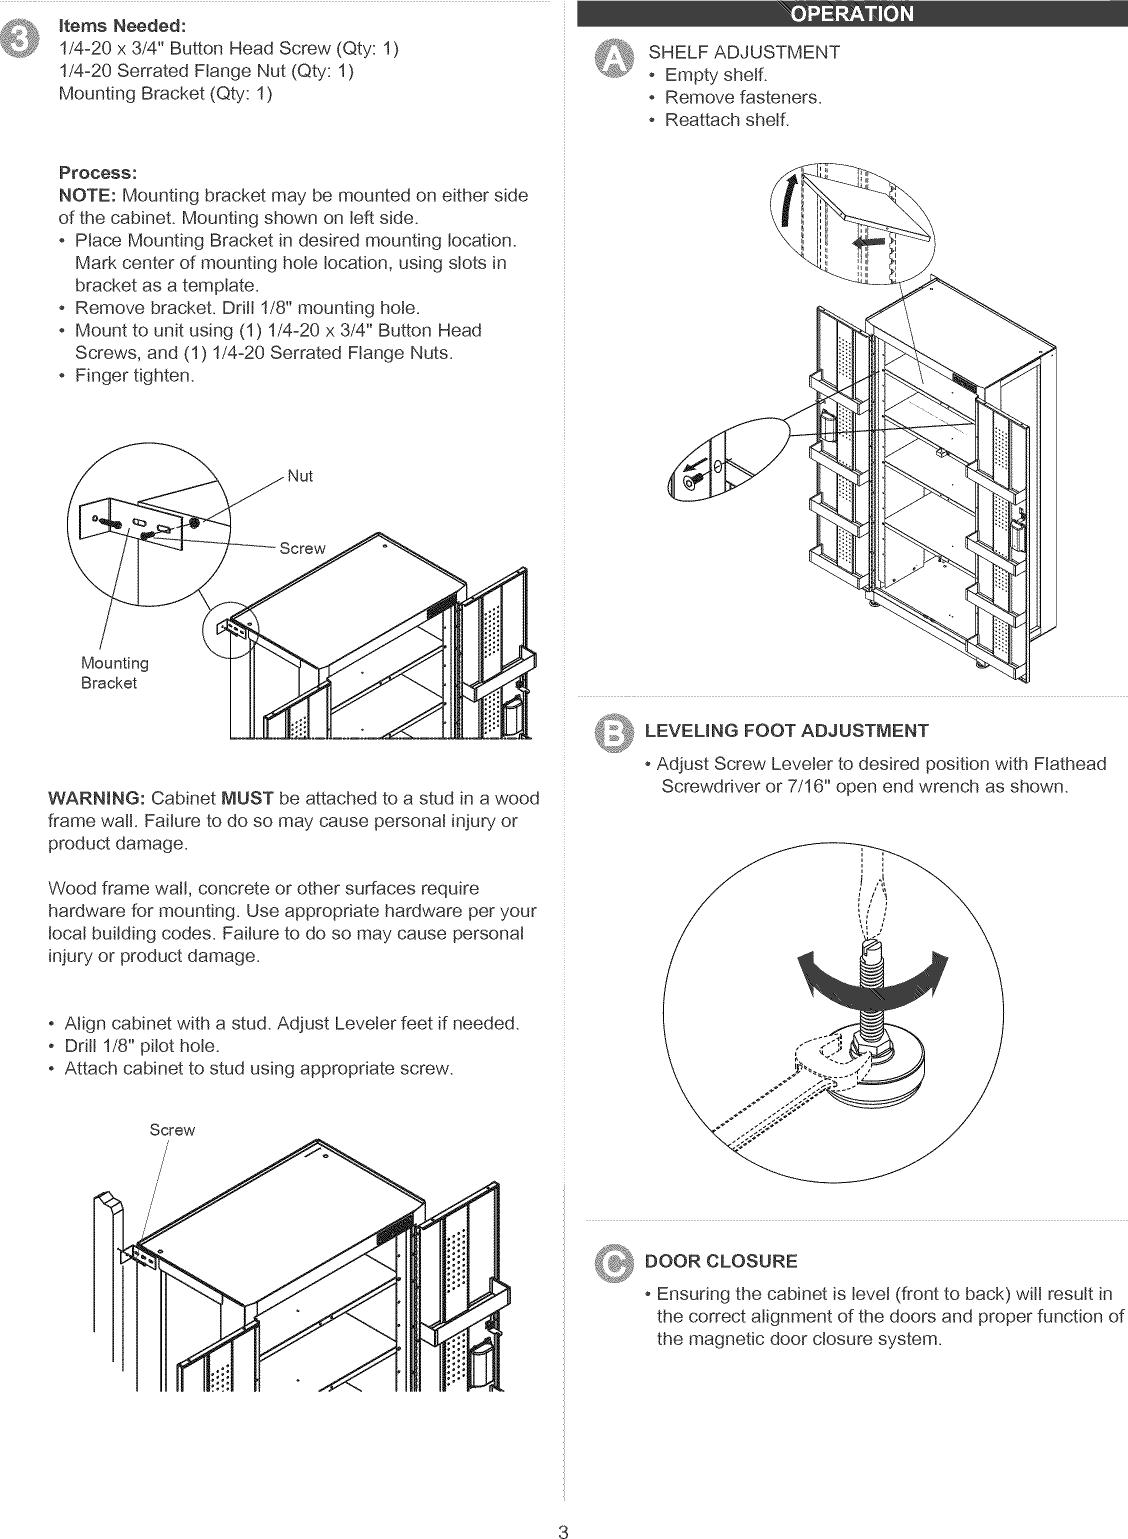 User Manual Floor Tool Cabinet Manuals, Craftsman Floor Cabinet Assembly Instructions